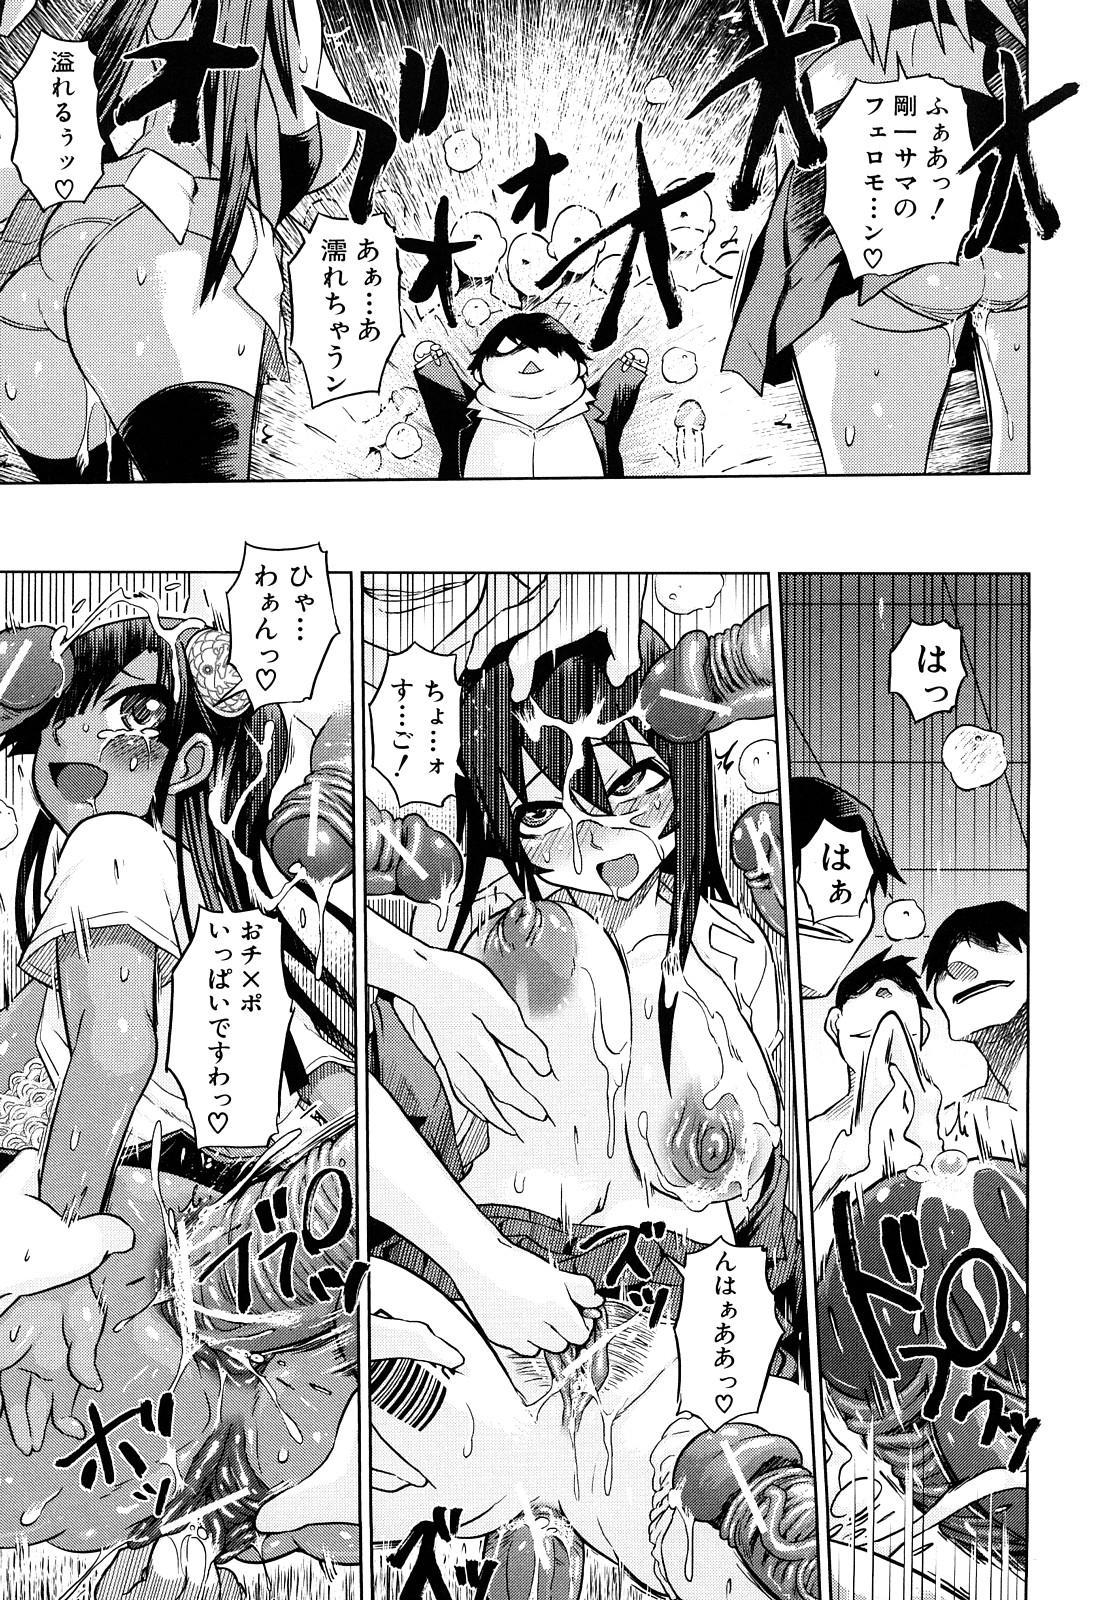 Seifuku Mesubuta Chitai - The Nymphomaniac Zone 199